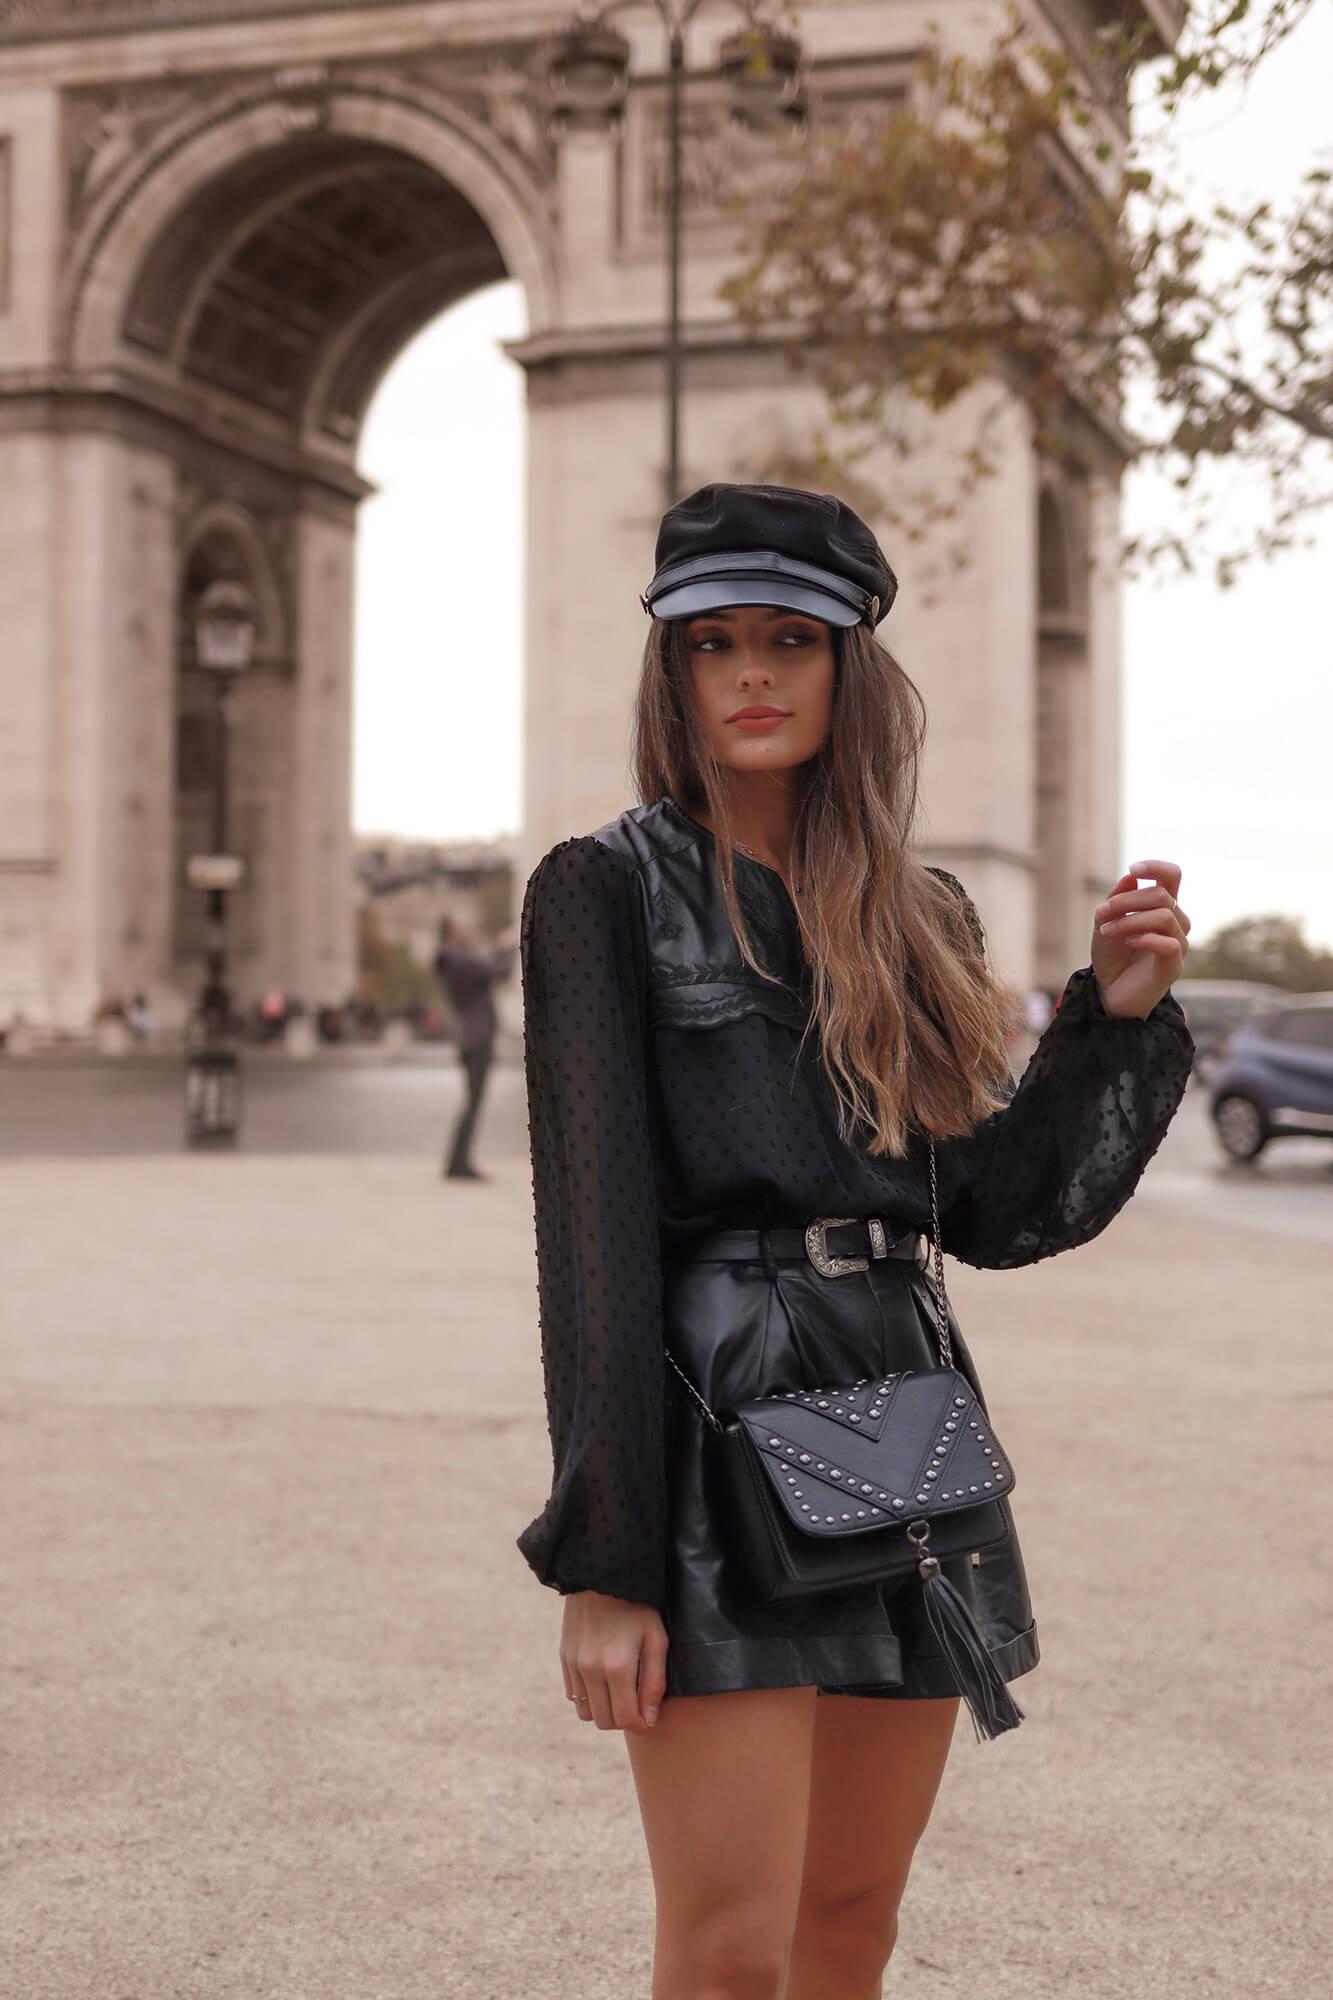 La jolie Adeline, pure fashionista parisienne